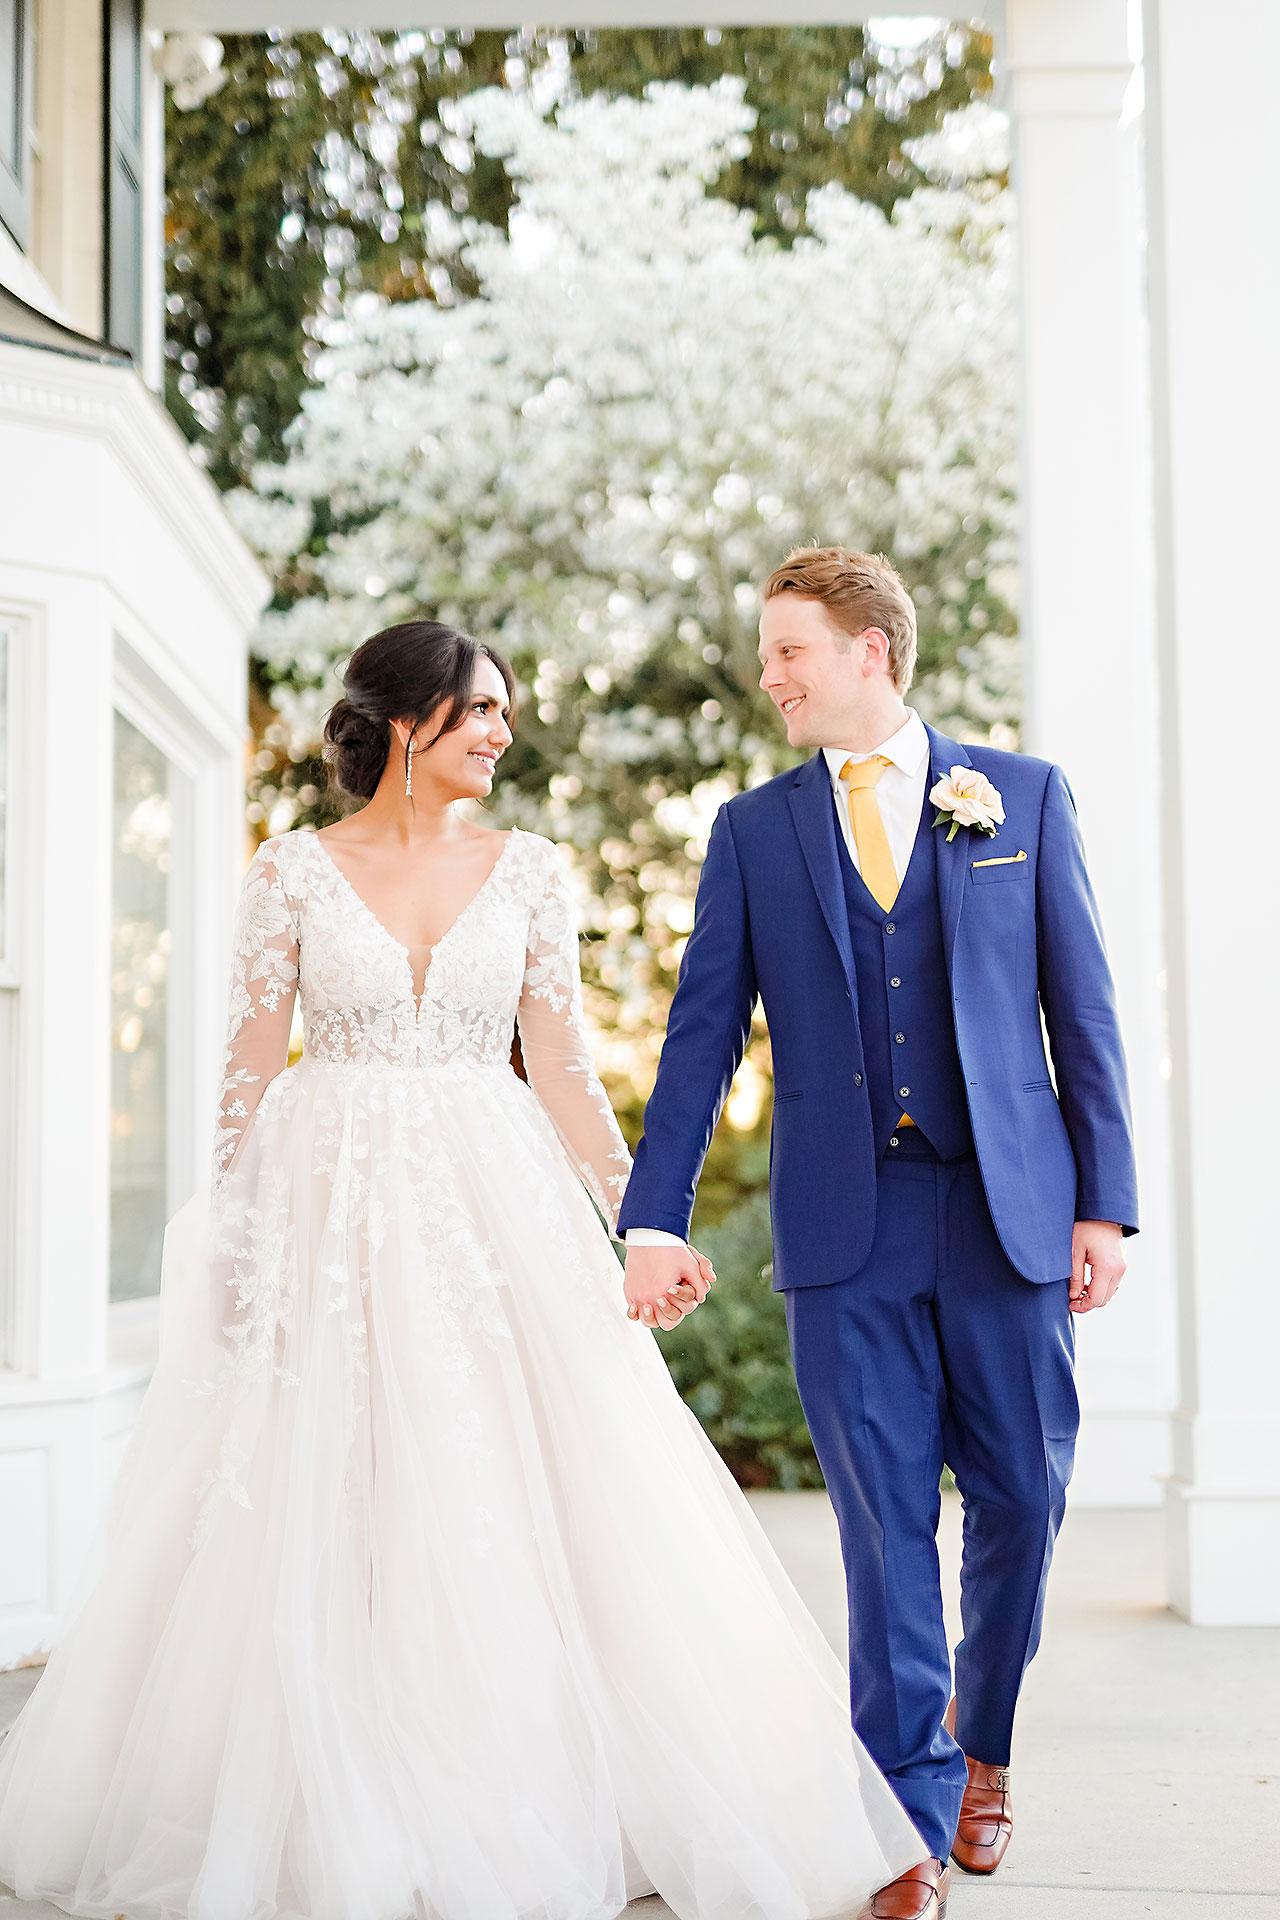 Nadia Parker Black Iris Estate Carmel Indiana Wedding May 2021 266